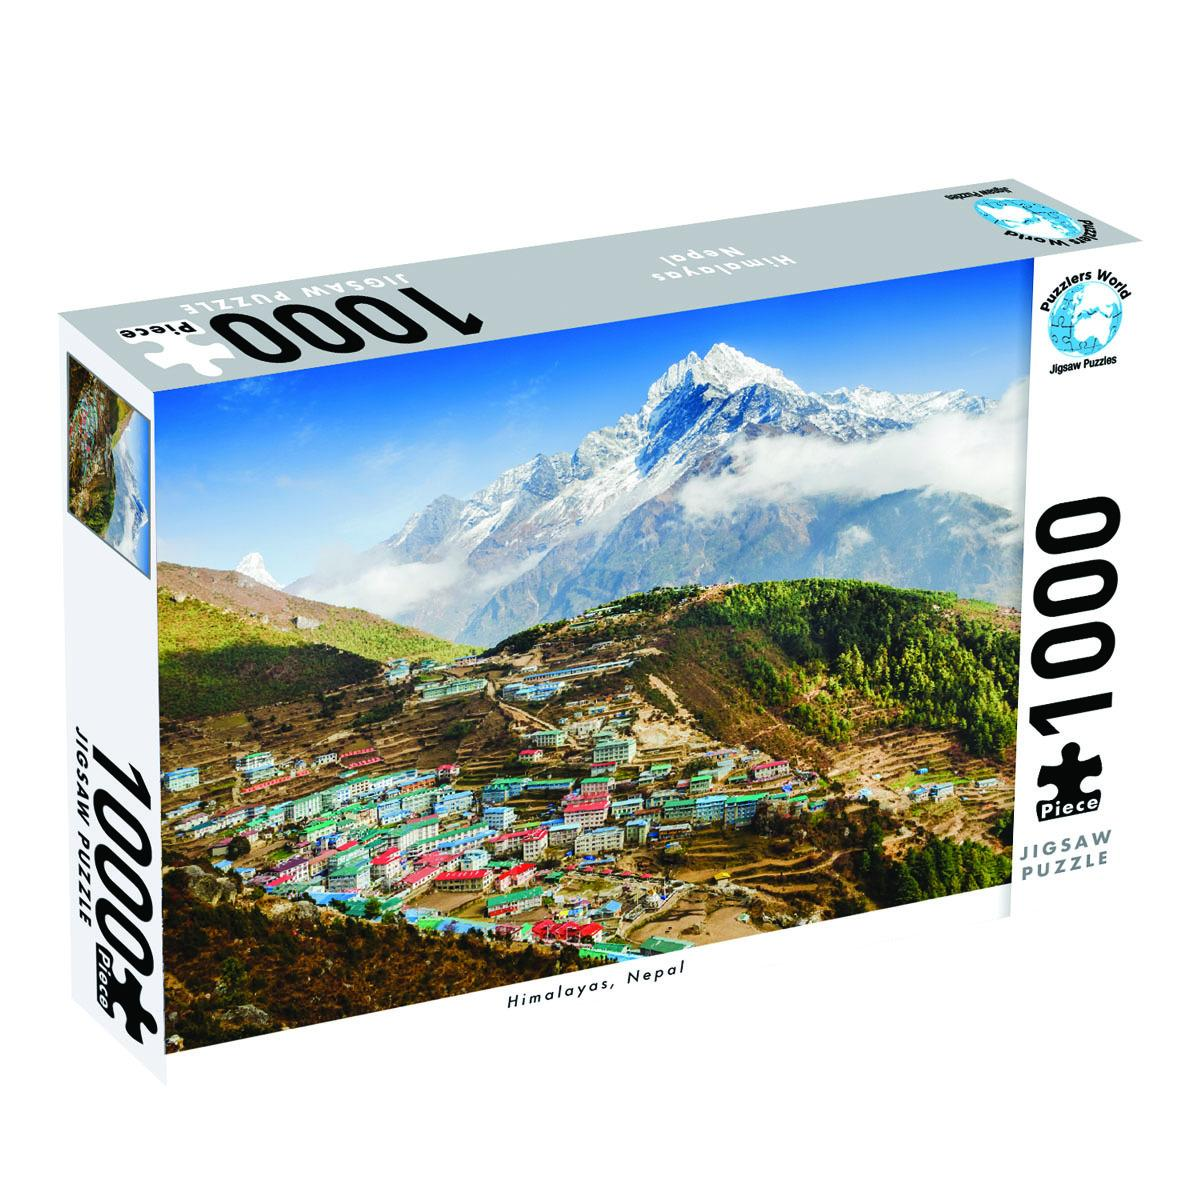 Himalayas Nepal 1000 PieceJigsawPuzzle